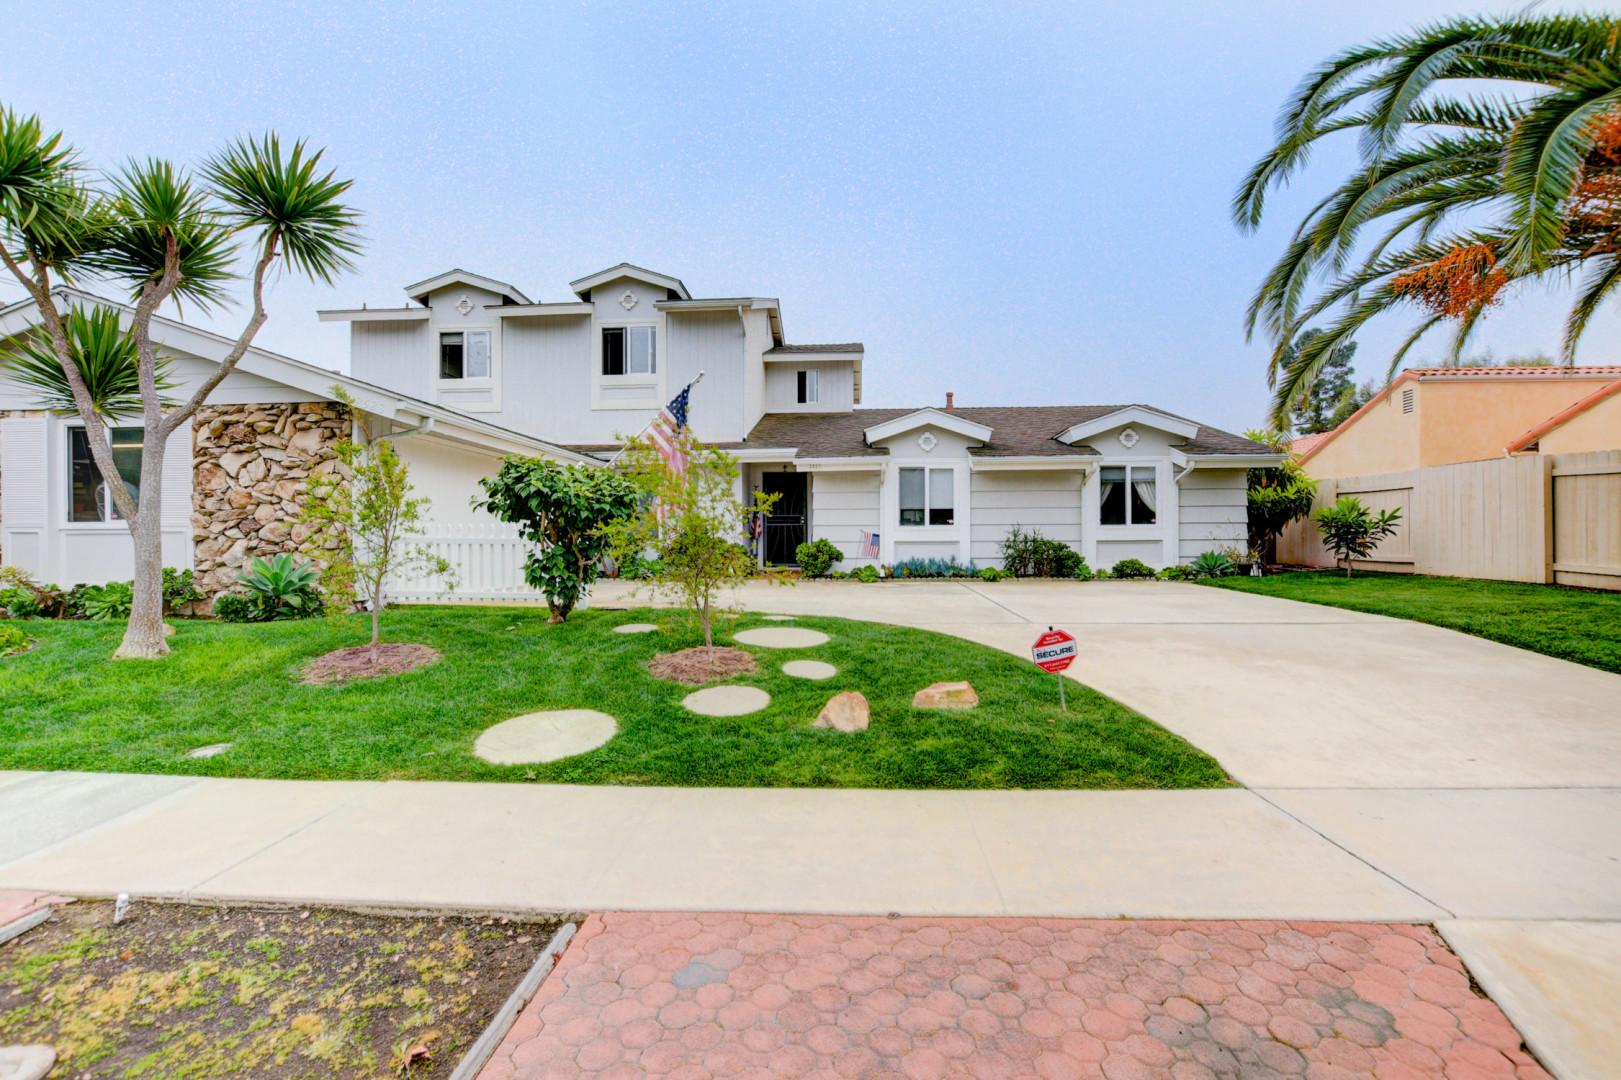 2523 Quidde Ave San Diego, CA 92122